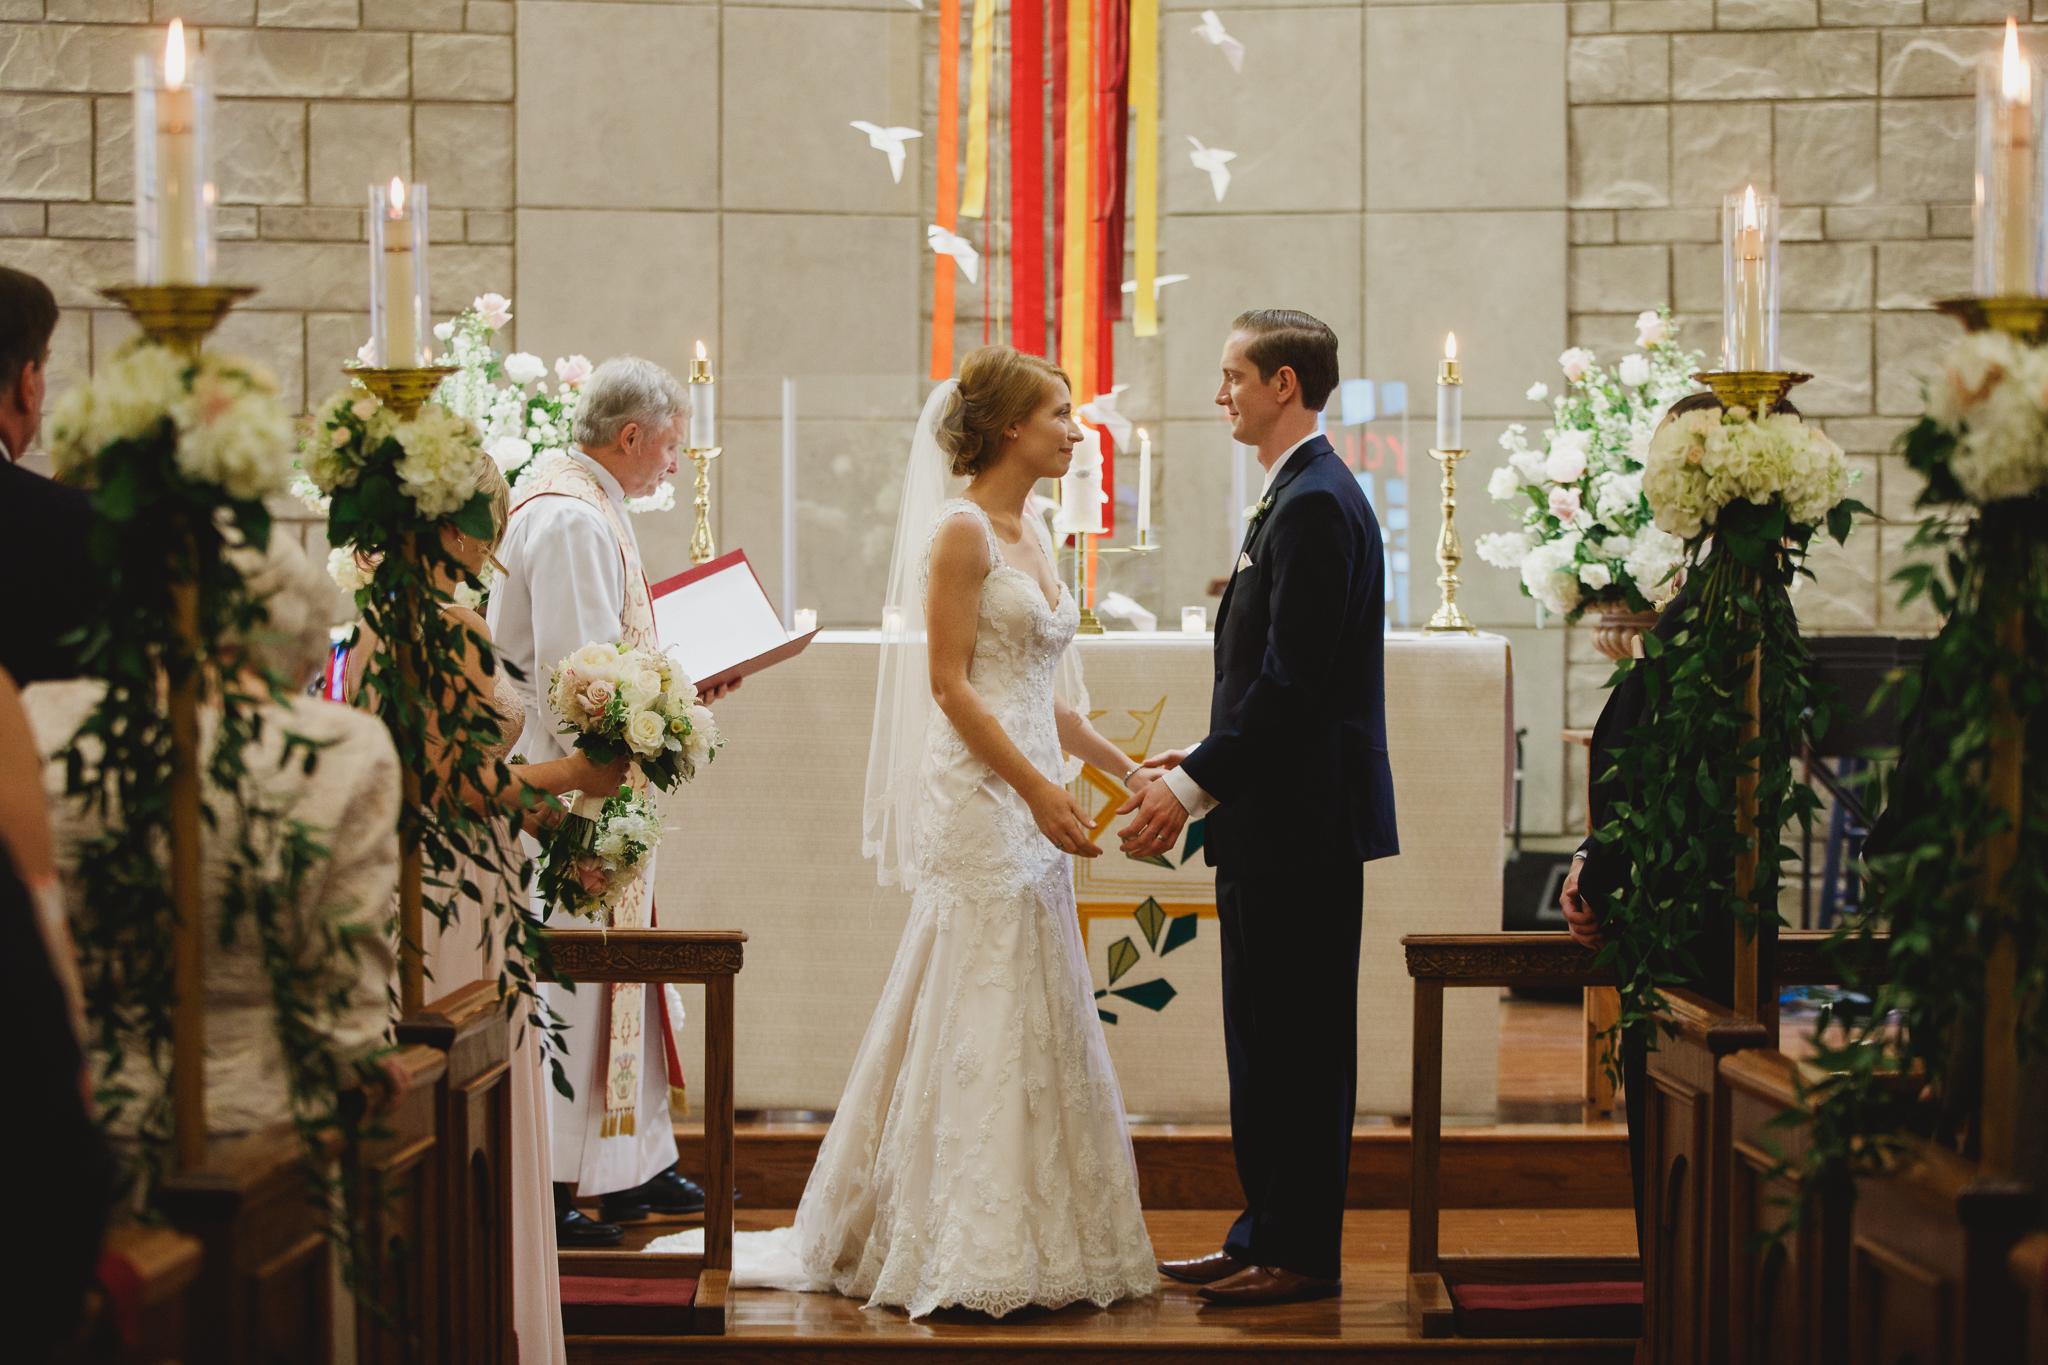 Michael and Kelly - the ashton depot - wedding DFW - wedding photographer- elizalde photography (50 of 150).jpg